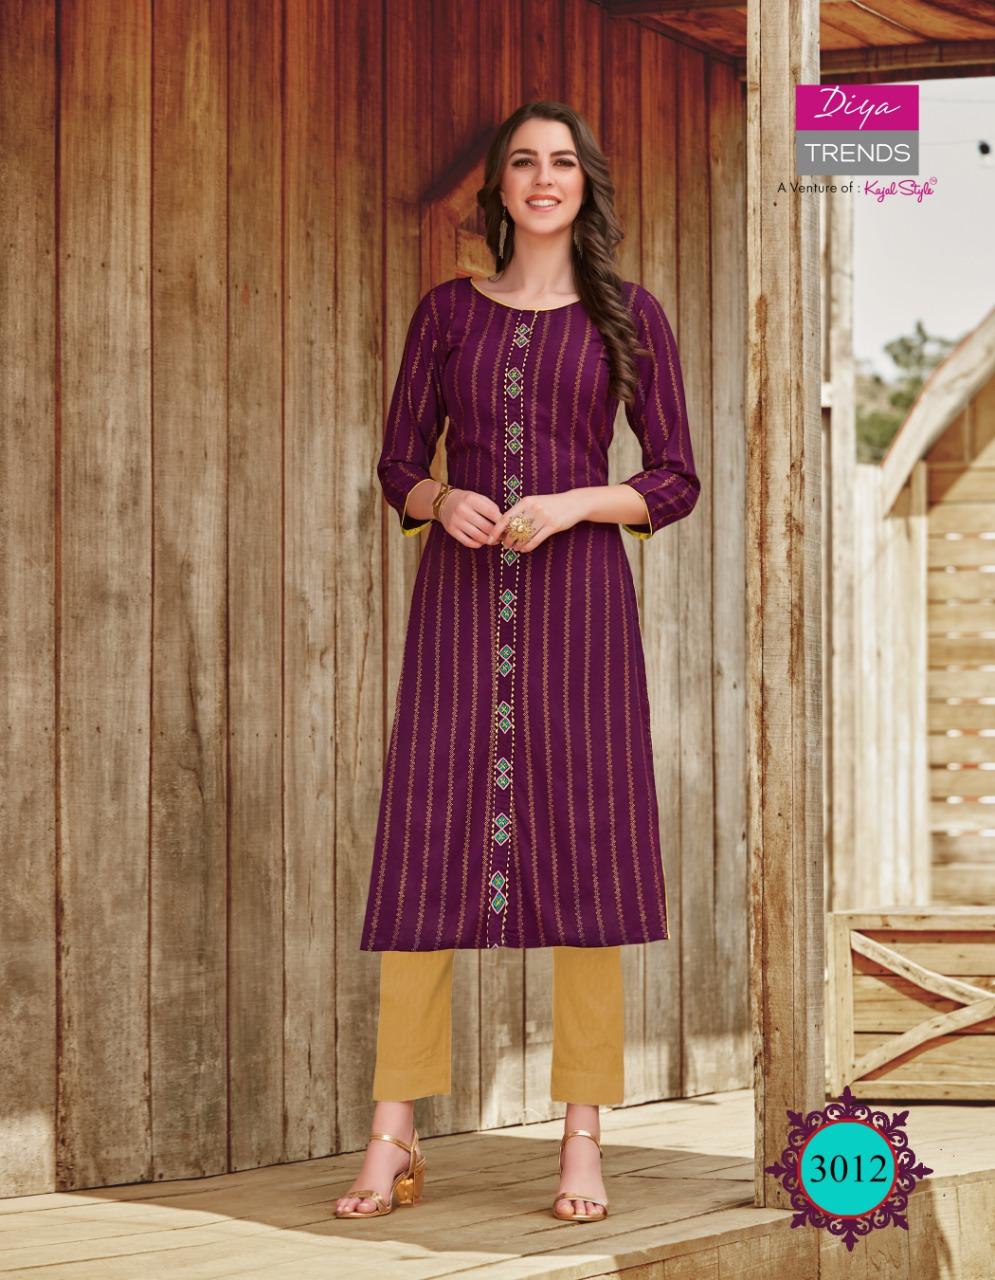 Diya Trends Victoria Vol 3 by Kajal Style Kurti Wholesale Catalog 12 Pcs 13 - Diya Trends Victoria Vol 3 by Kajal Style Kurti Wholesale Catalog 12 Pcs